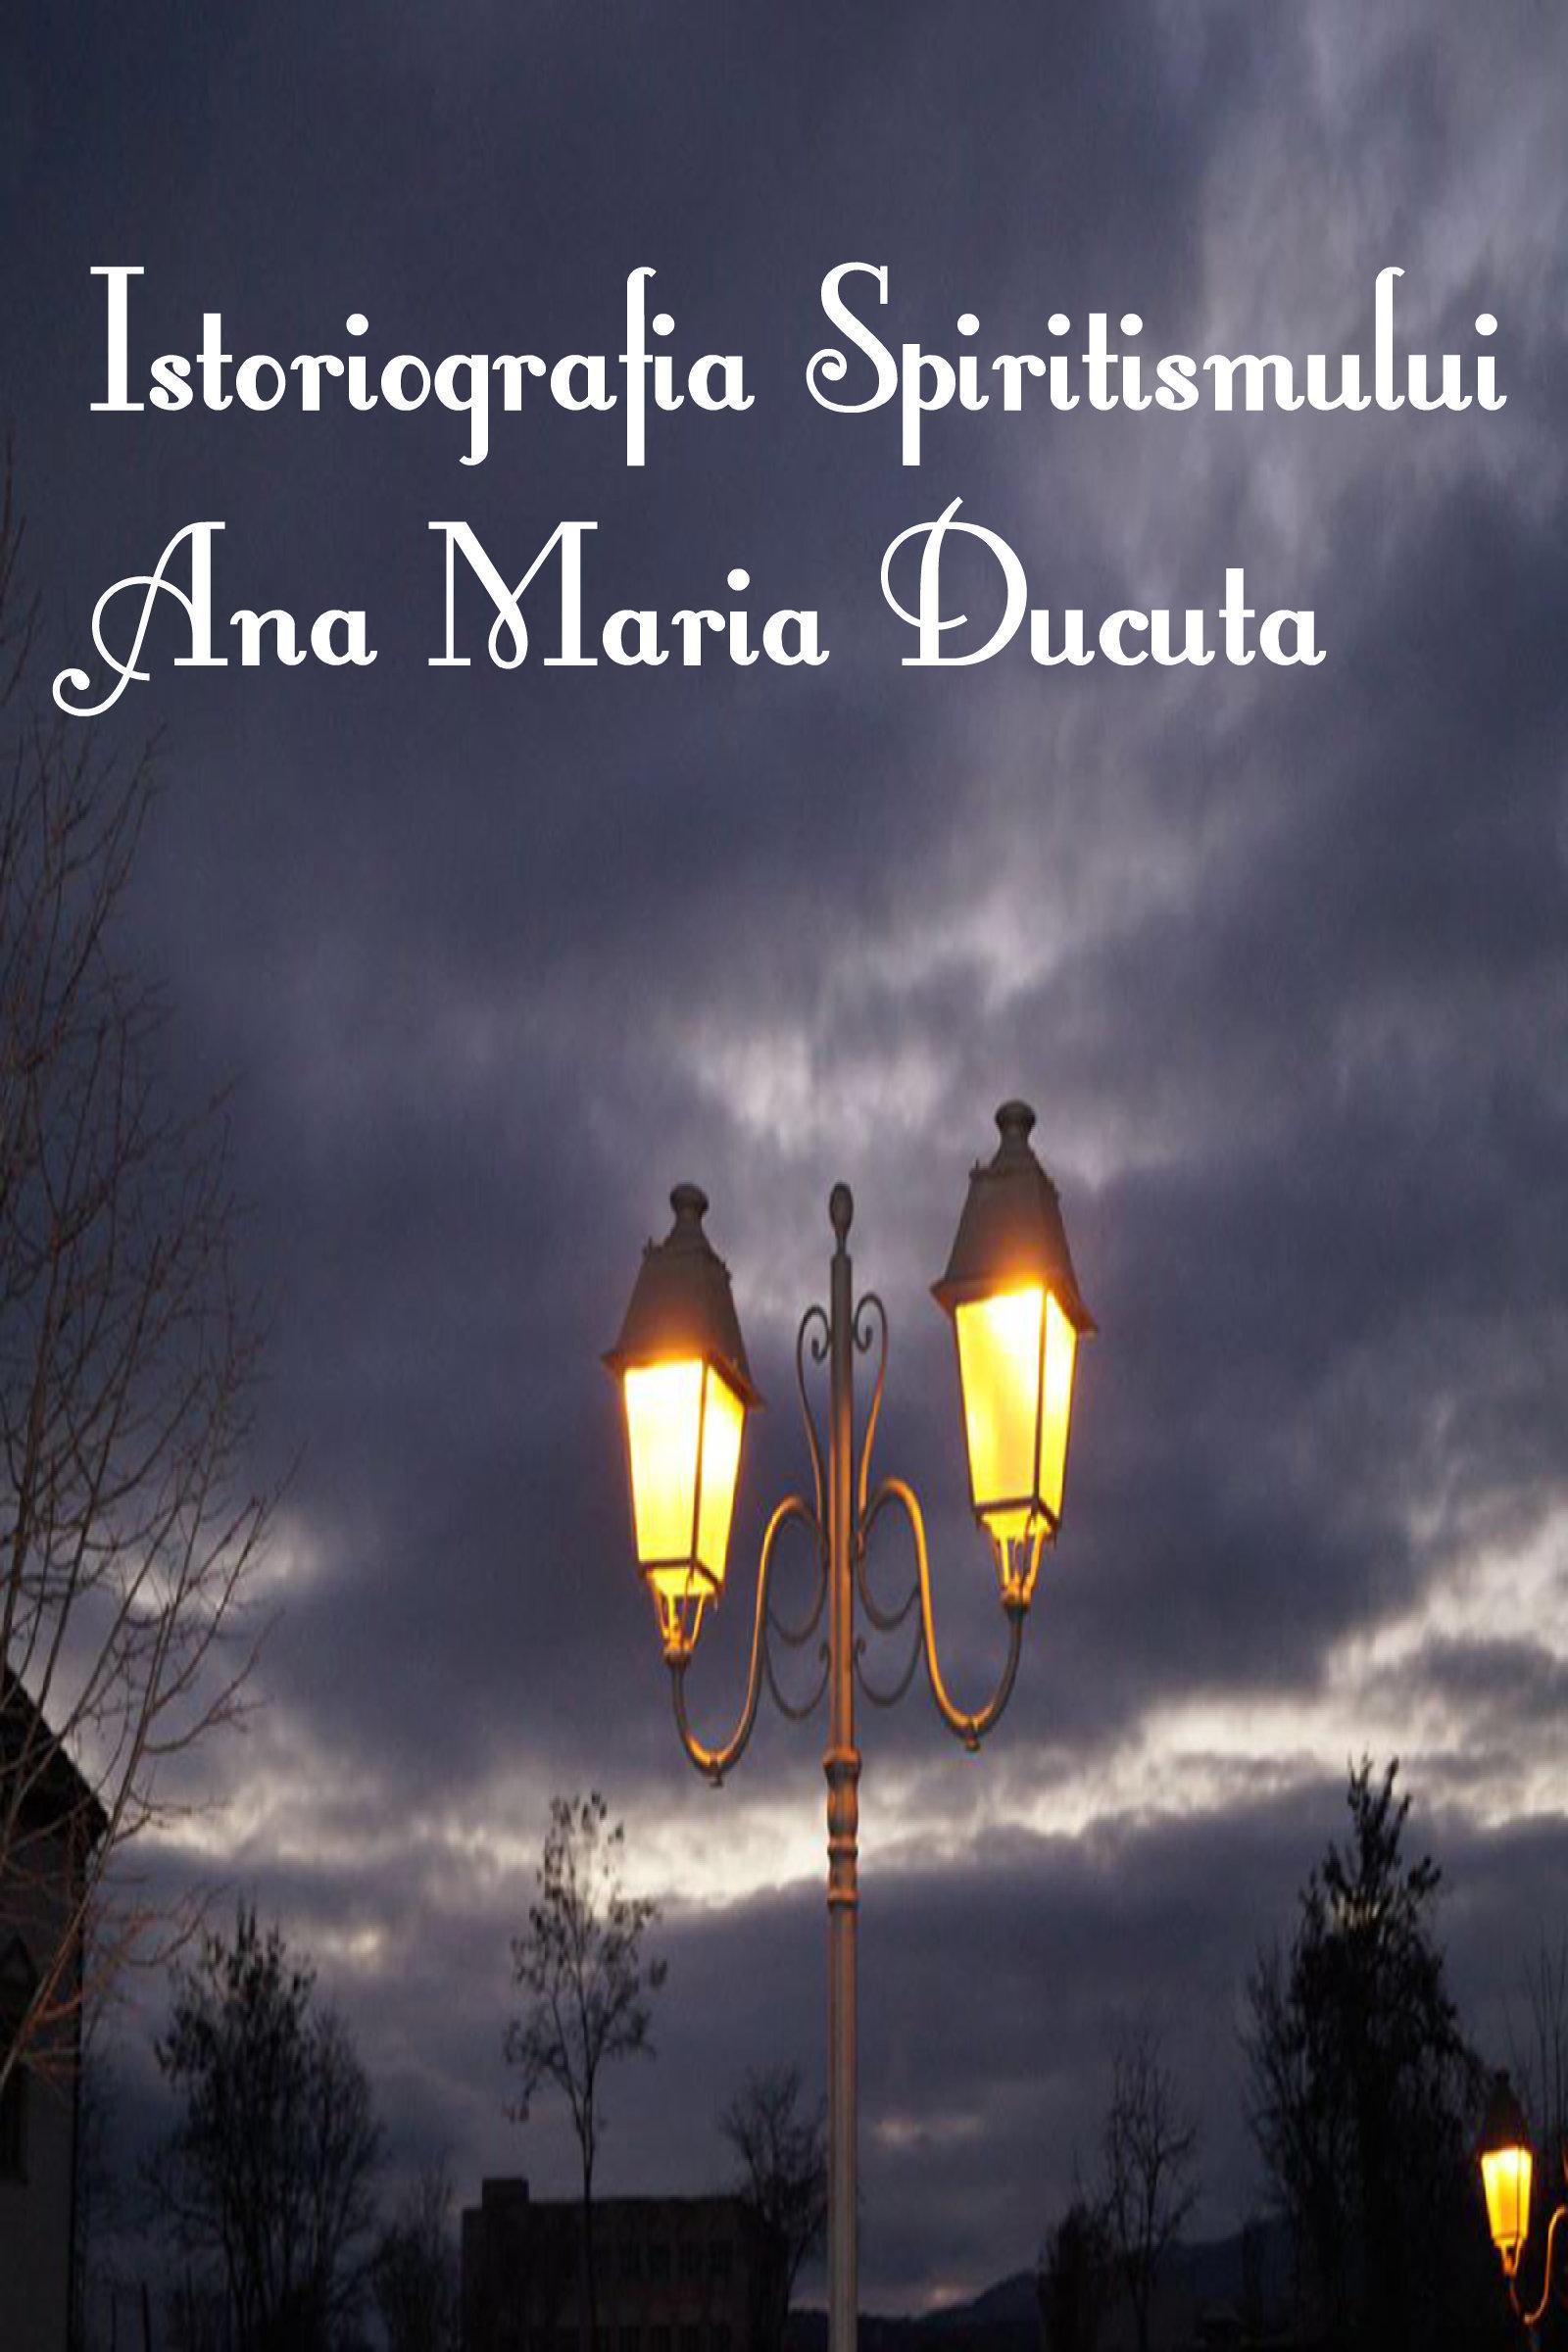 Istoriografia Spiritismului  by  Ana Maria Ducuta